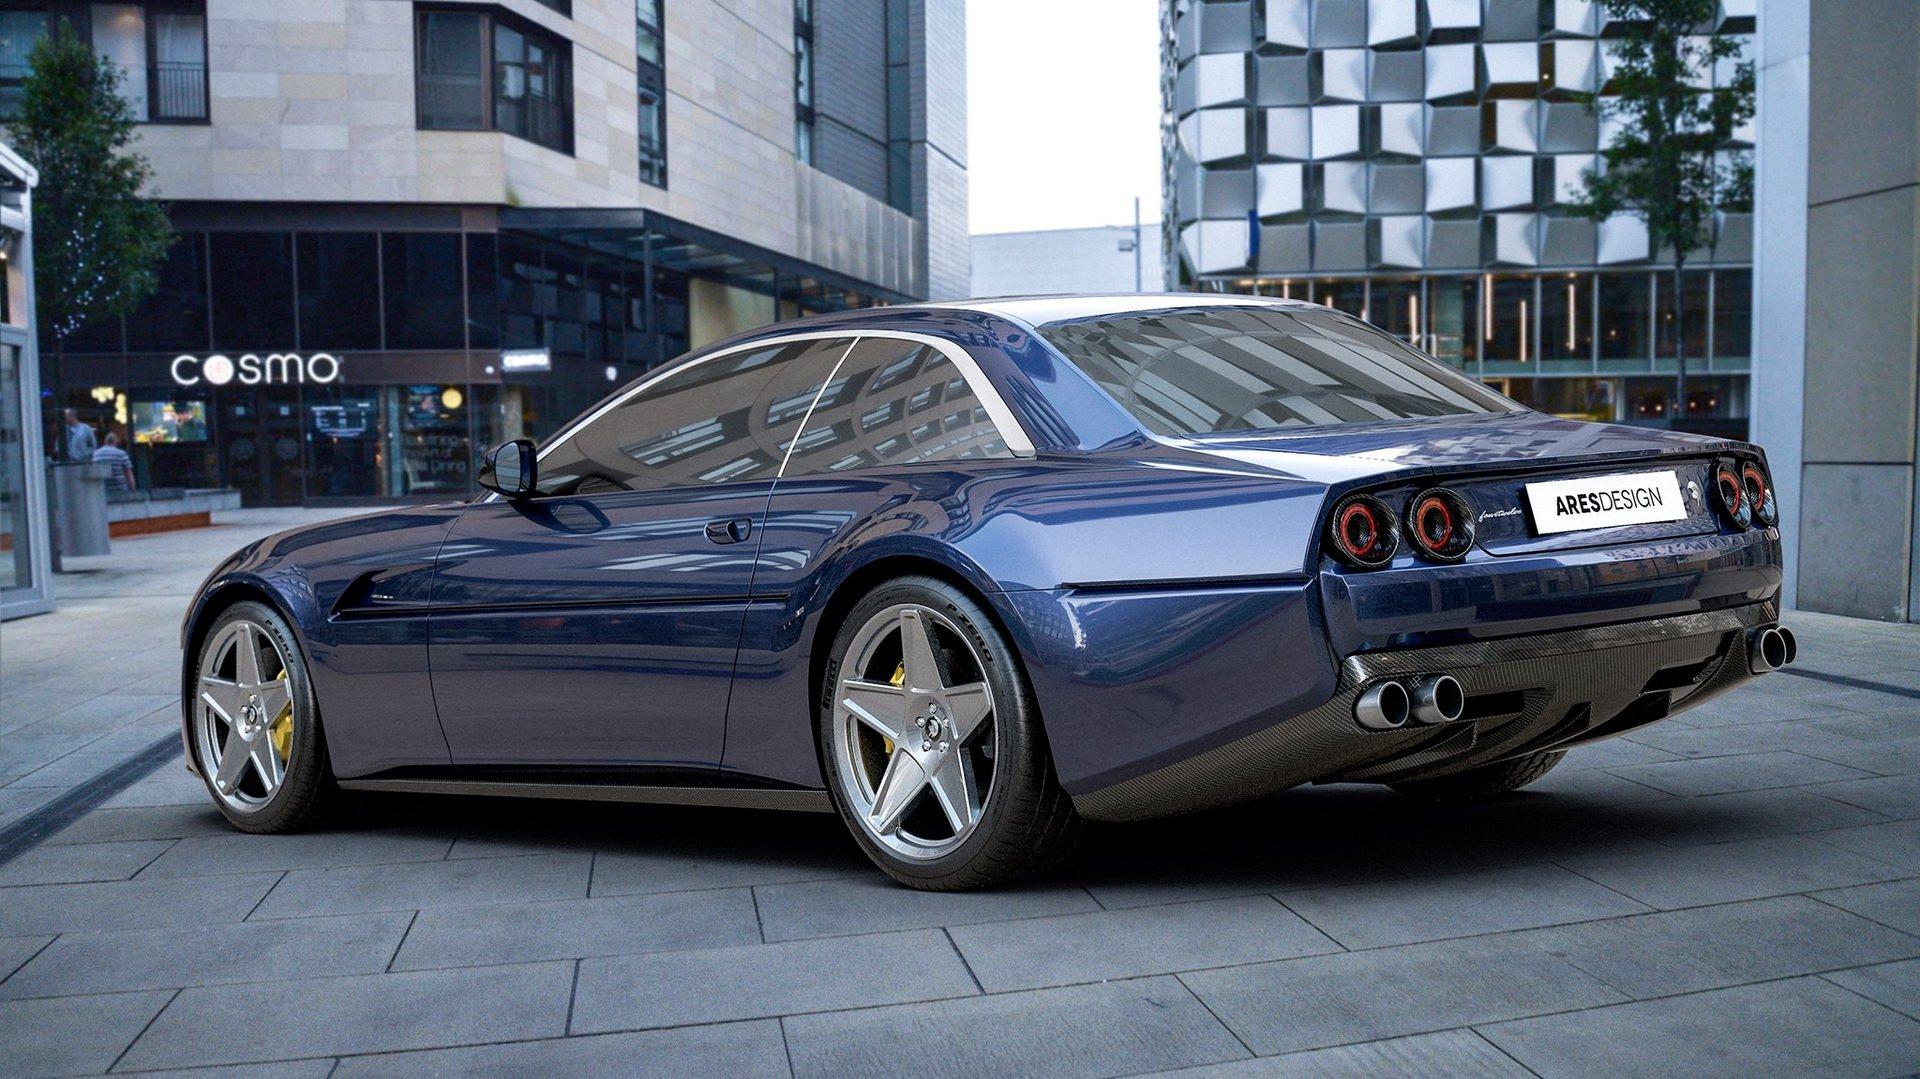 Ferrari GTC4Lusso by Ares Design (1)